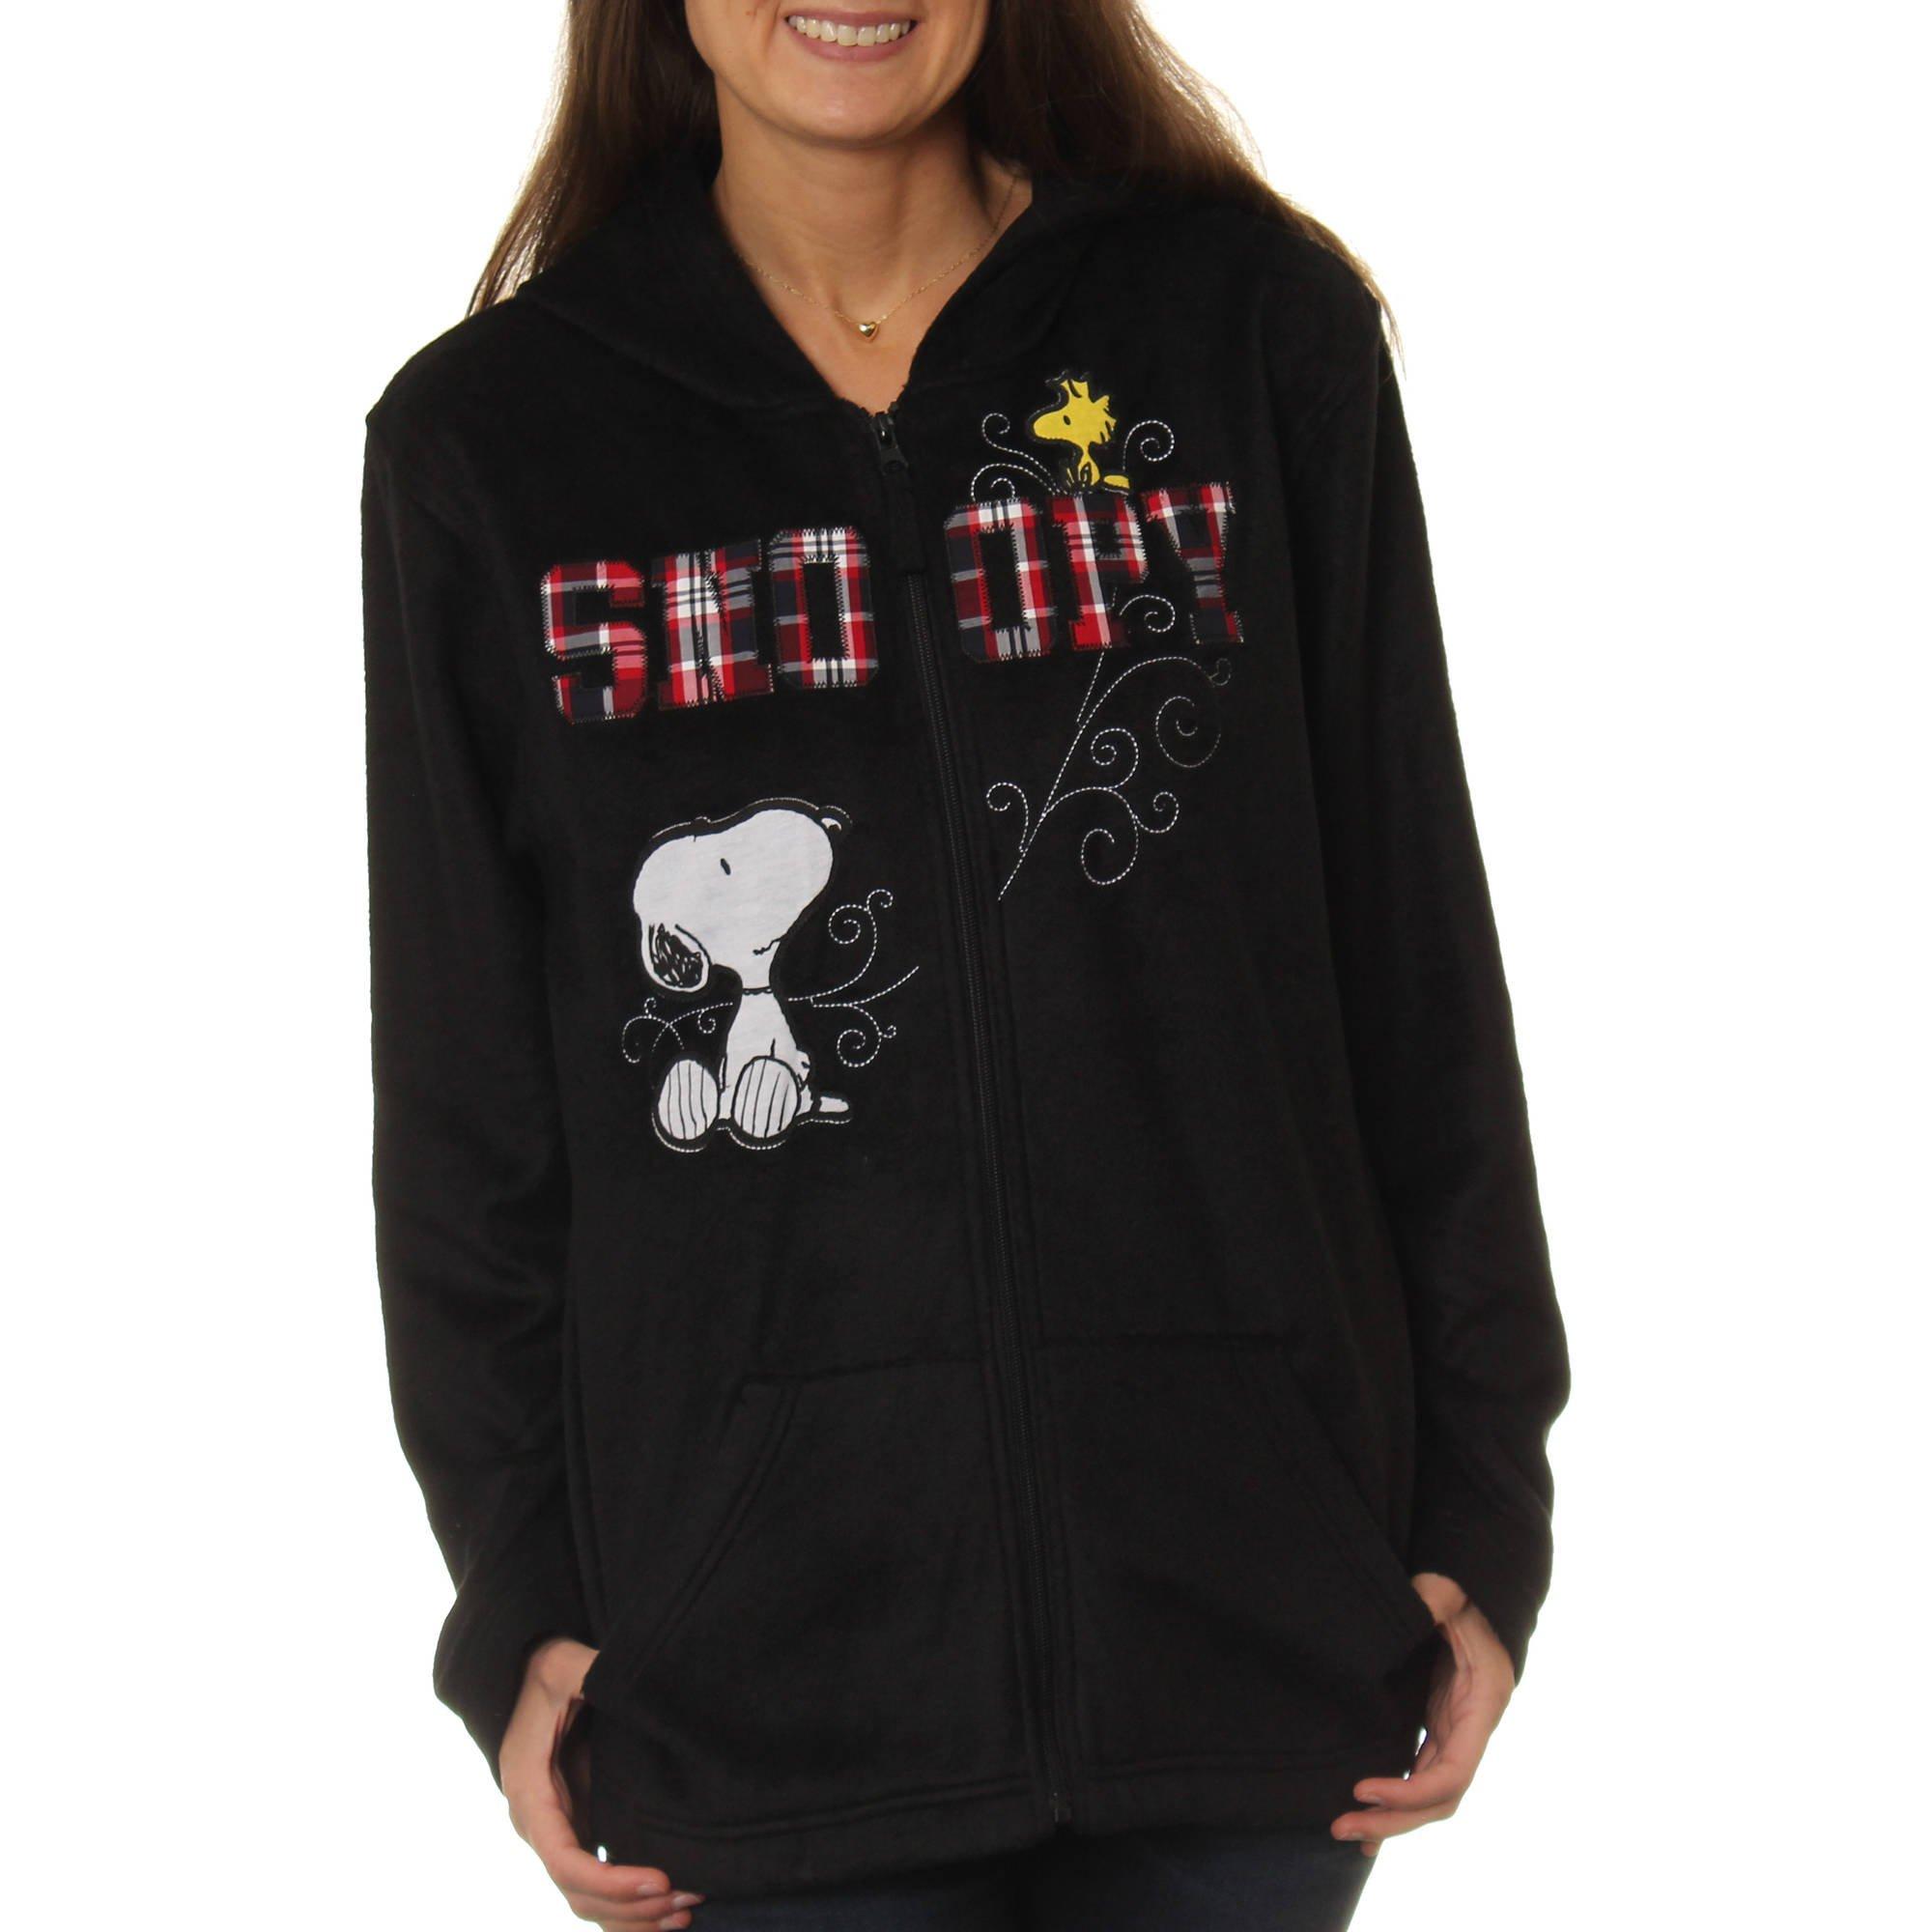 Peanuts Women's Snoopy & Woodstock Plush Fleece Full Zip Hoodie, Black, Small / 4 - 6